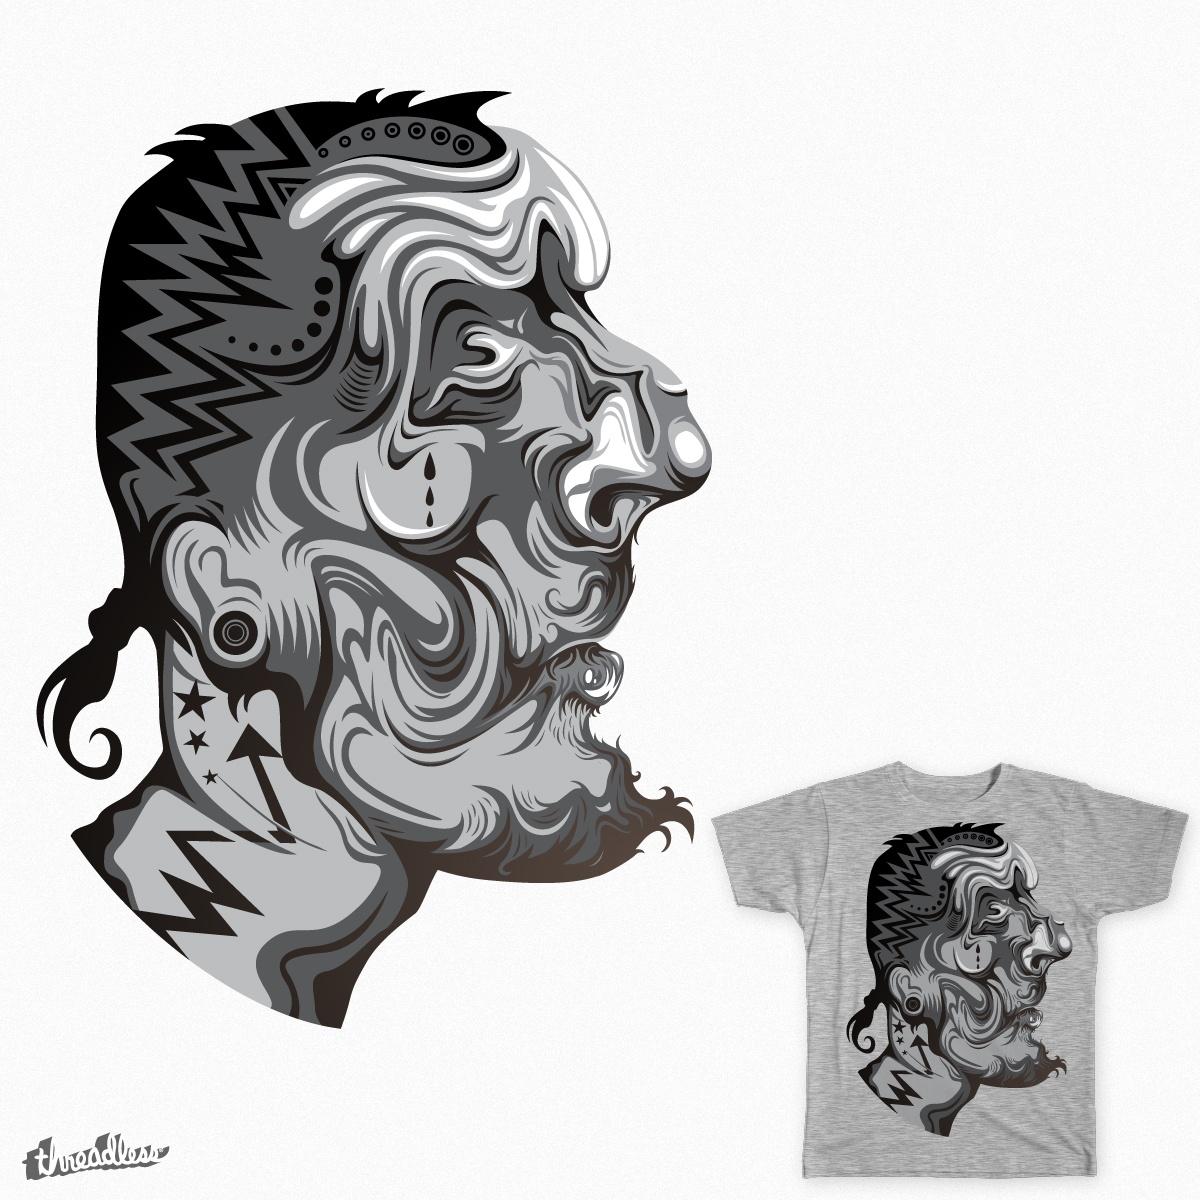 Chosen Hipster Mohawk by ZXDubstep on Threadless